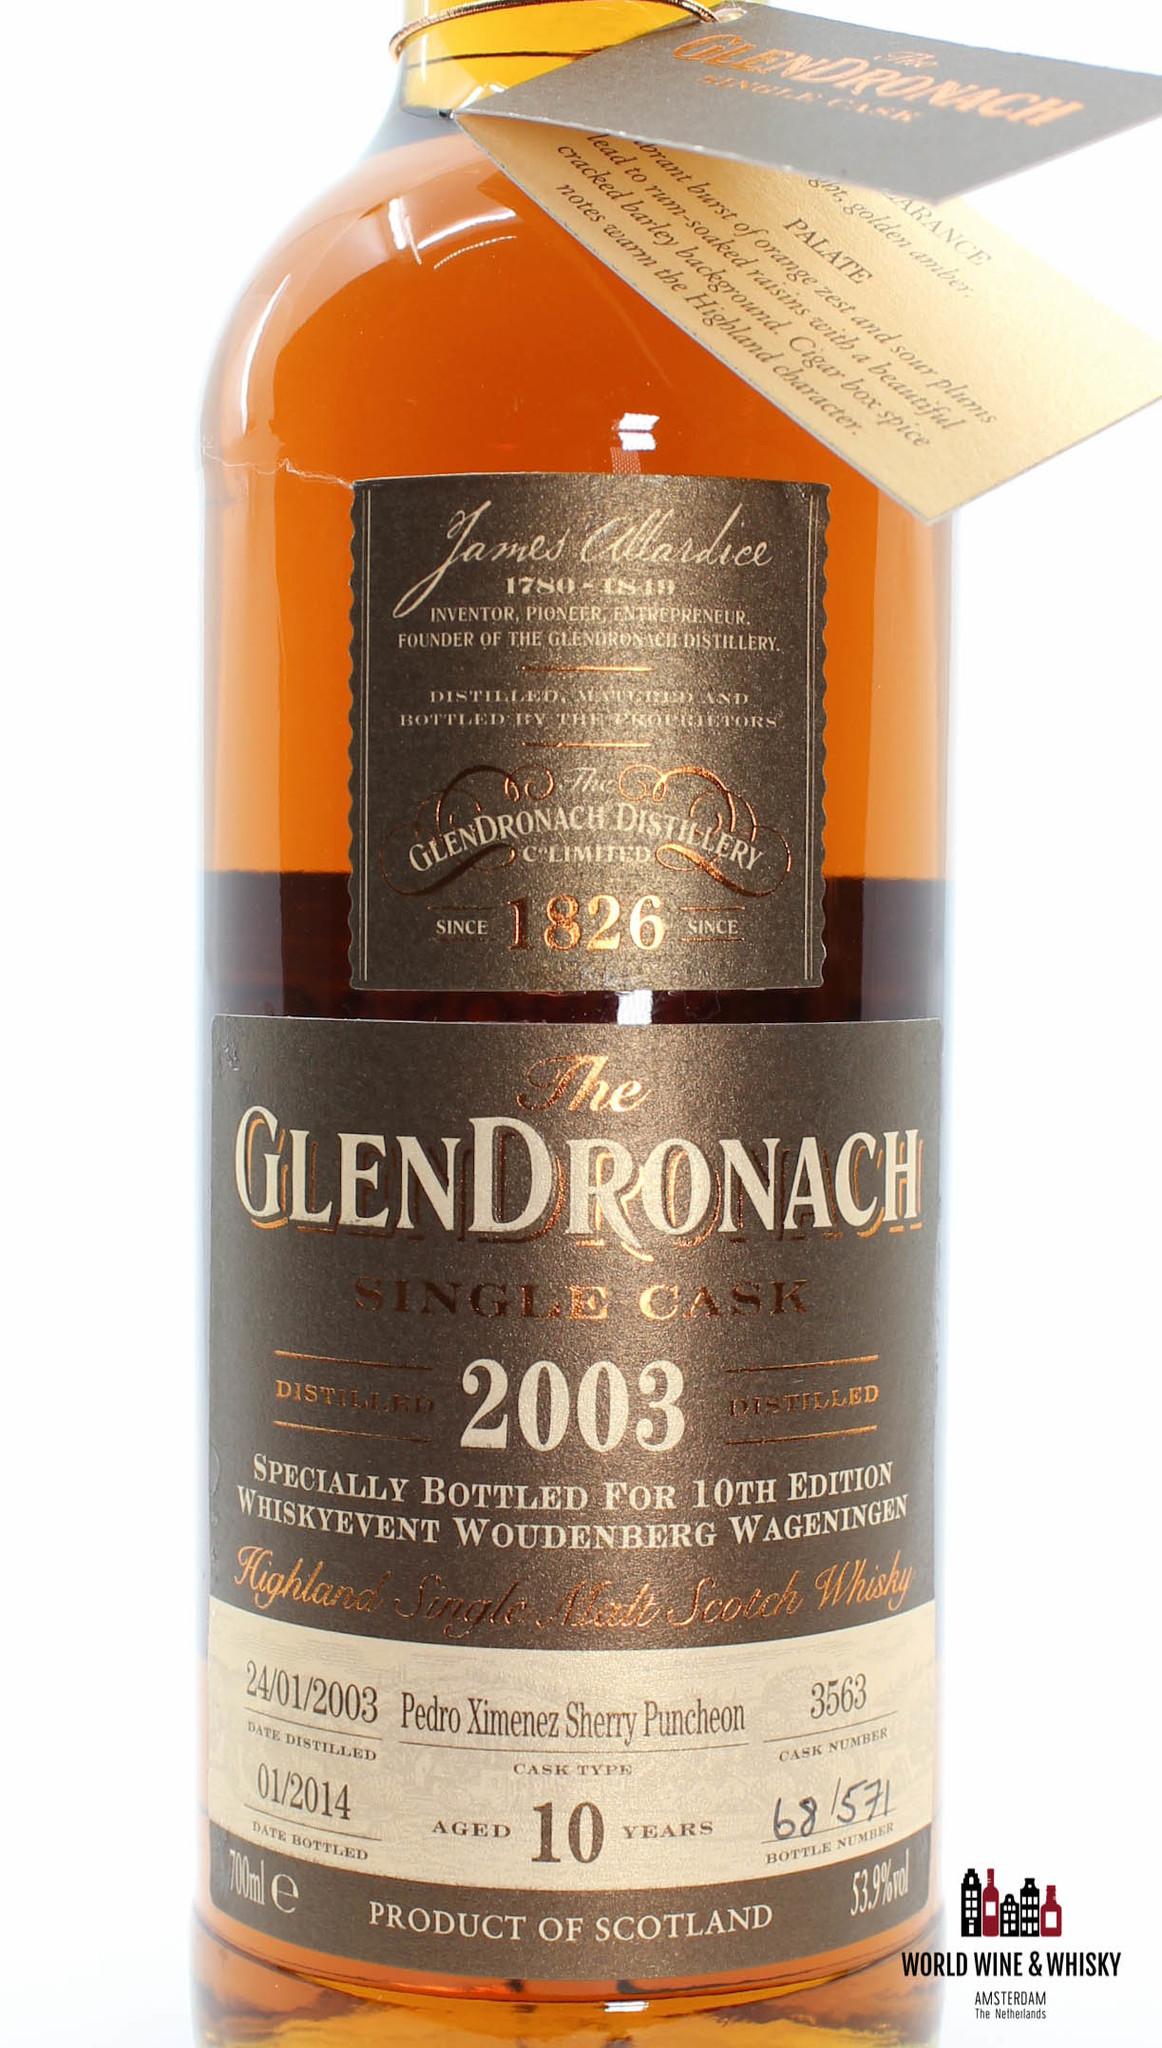 Glendronach Glendronach 10 Years Old 2003 2014 Single Cask - Cask 3563 - 10th Edition Whiskyevent Woudenberg Wageningen 53.9%